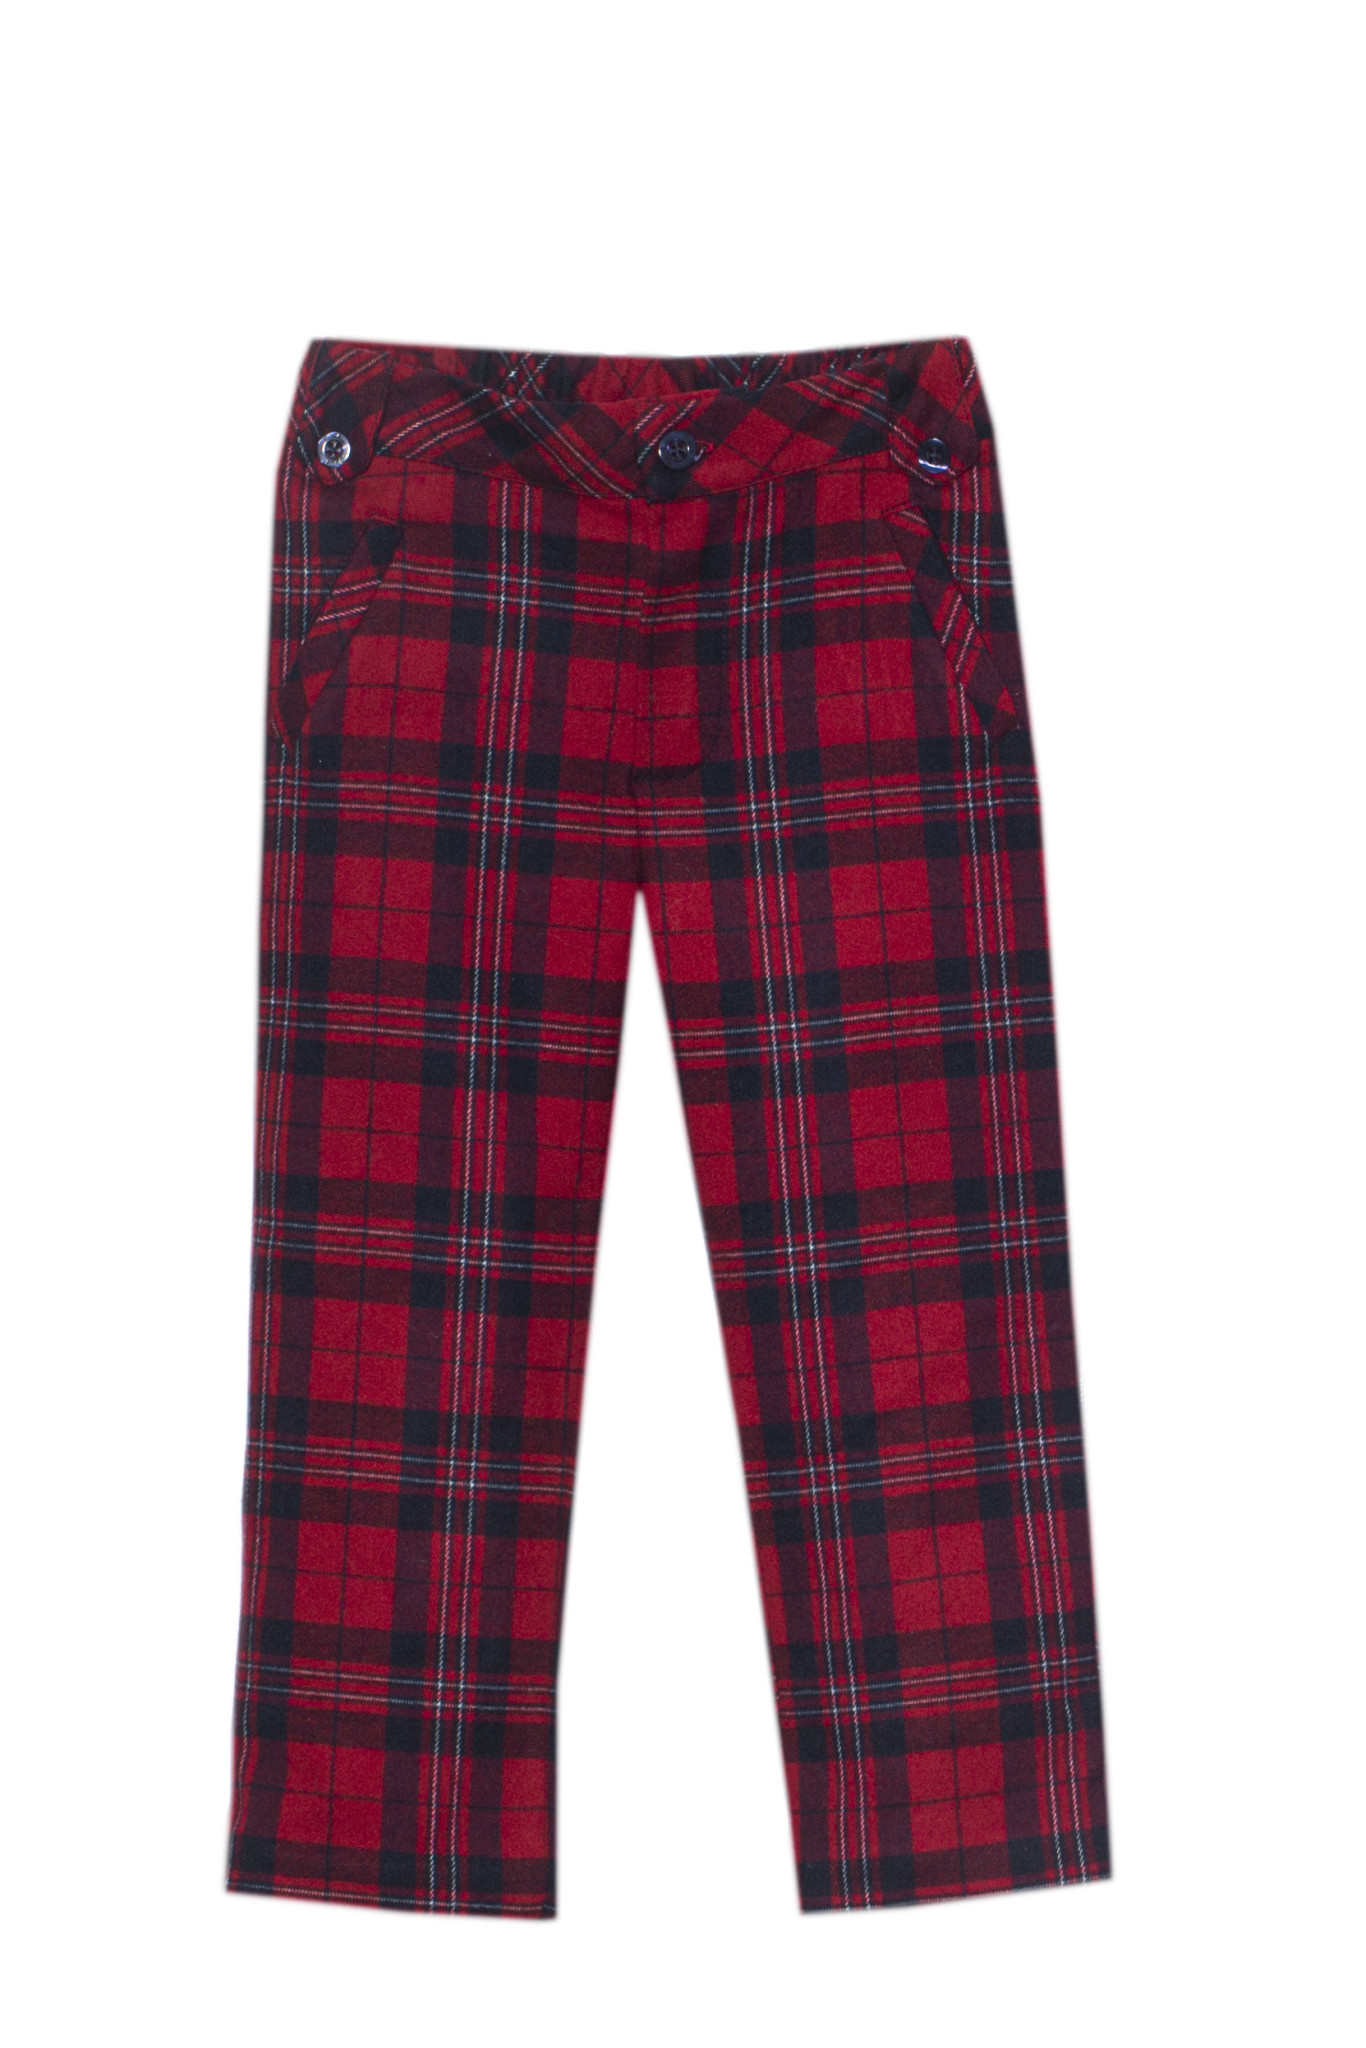 Patachou Patachou Tartan Collar Polo Shirt & Tartan Trousers